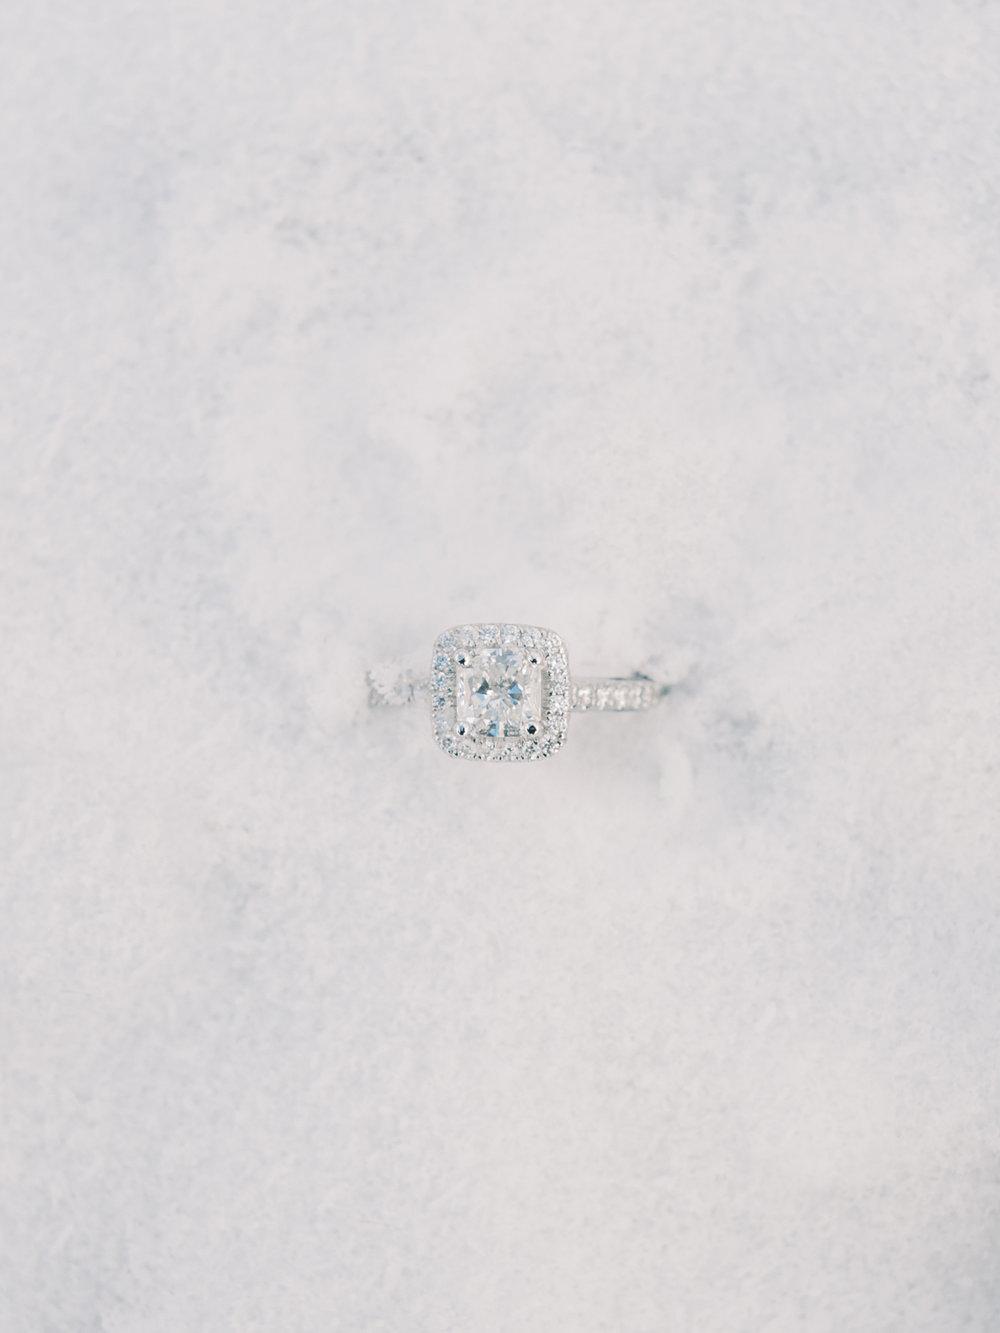 snowy-georgia-proposal-preachers-rock-atlanta-dahlonega-wedding-photographer-hannah-forsberg-fine-art-film-47.jpg